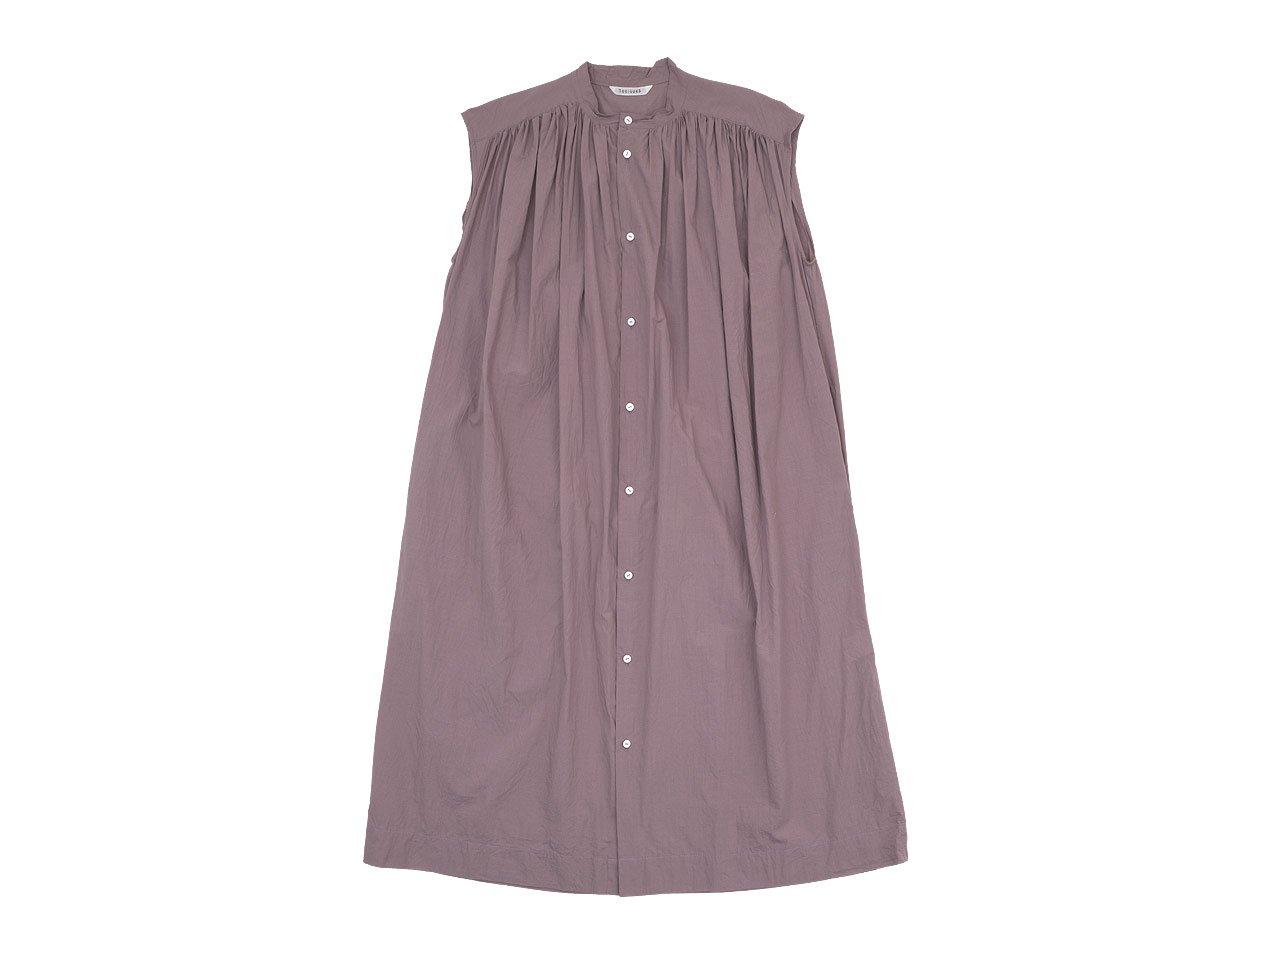 TOUJOURS Pleated Sleeveless Shirt Dress DUSTY ROSE 【MM32ND03】